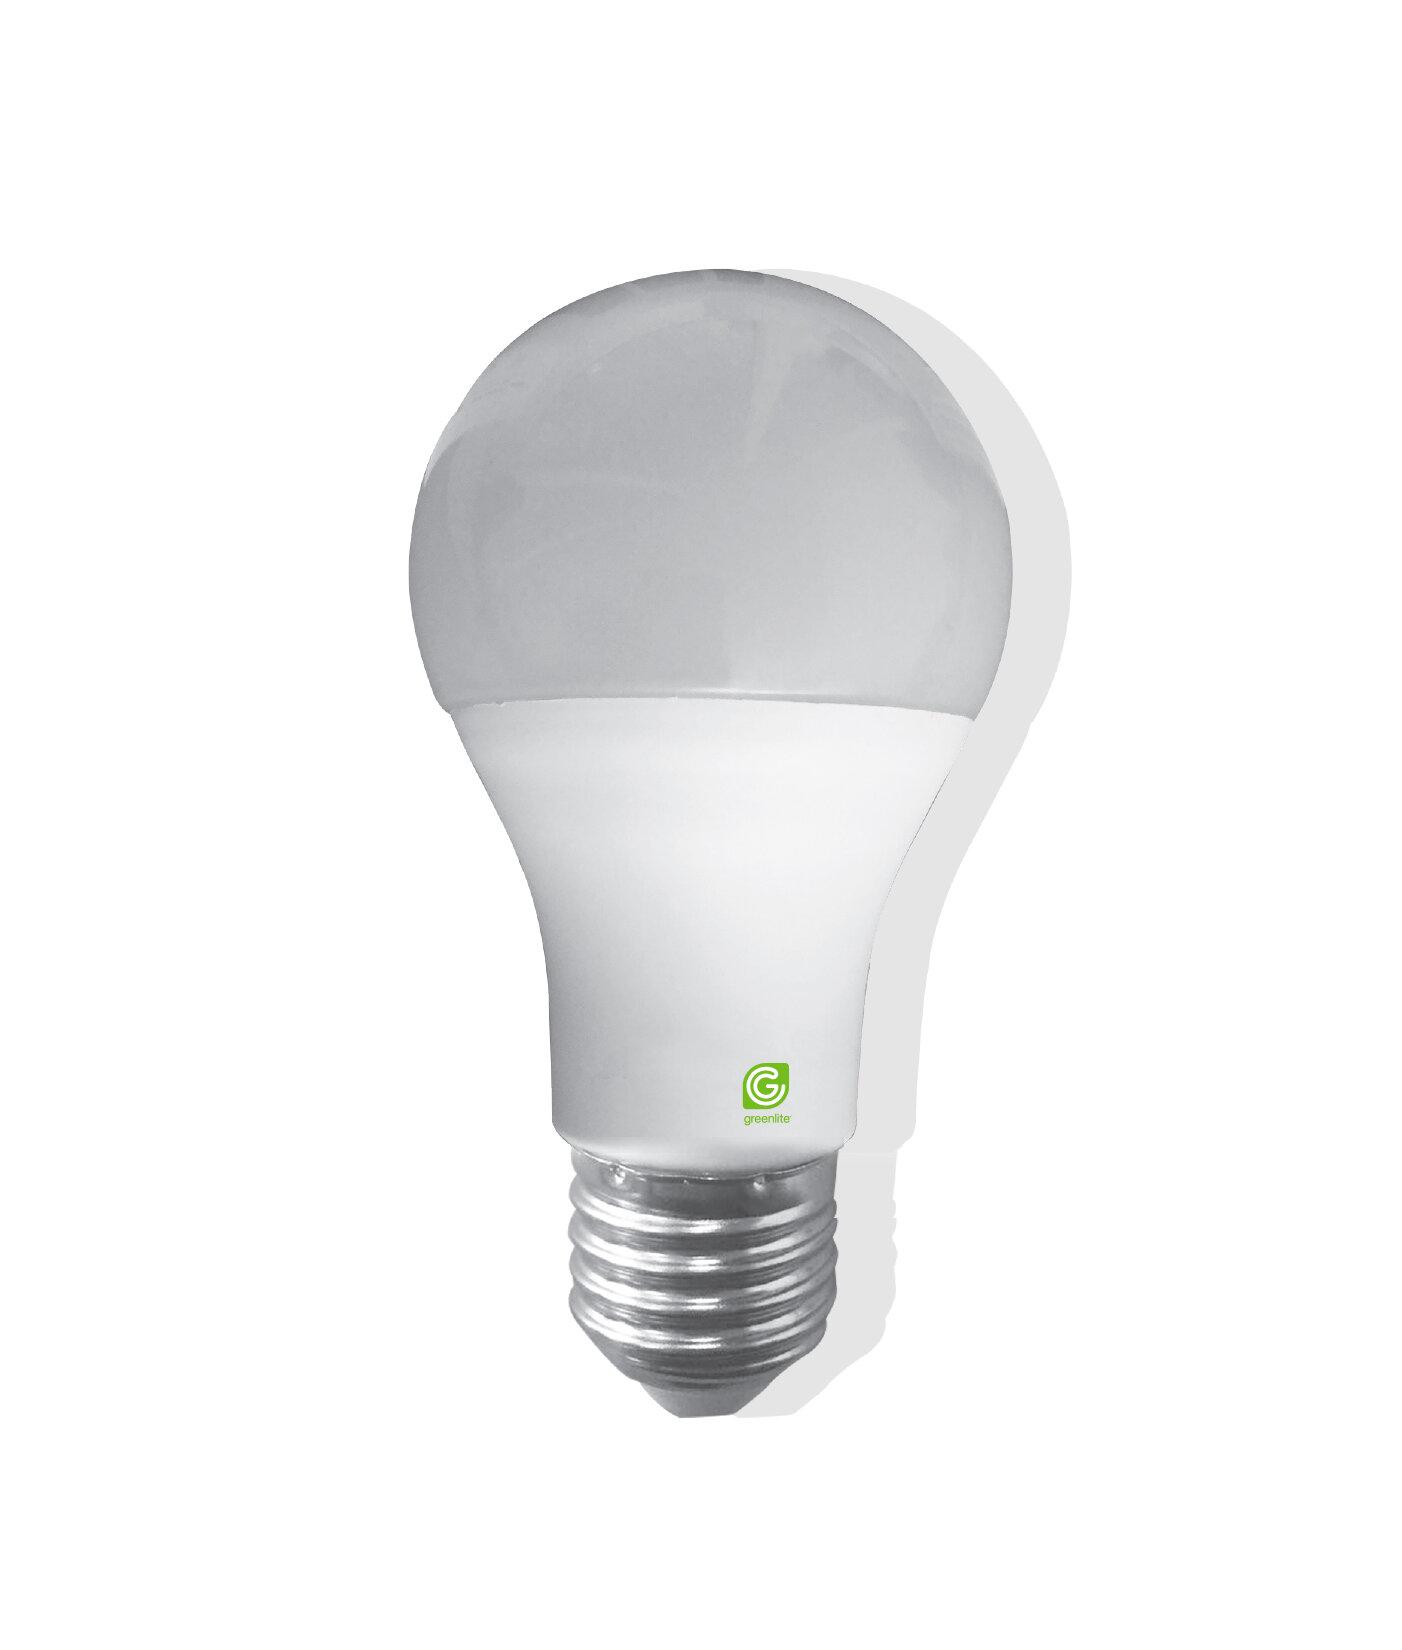 Greenlite 11 Watt 75 Watt Equivalent A19 Led Smart Dimmable Light Bulb Warm White 2700k E26 Medium Standard Base Wayfair Ca